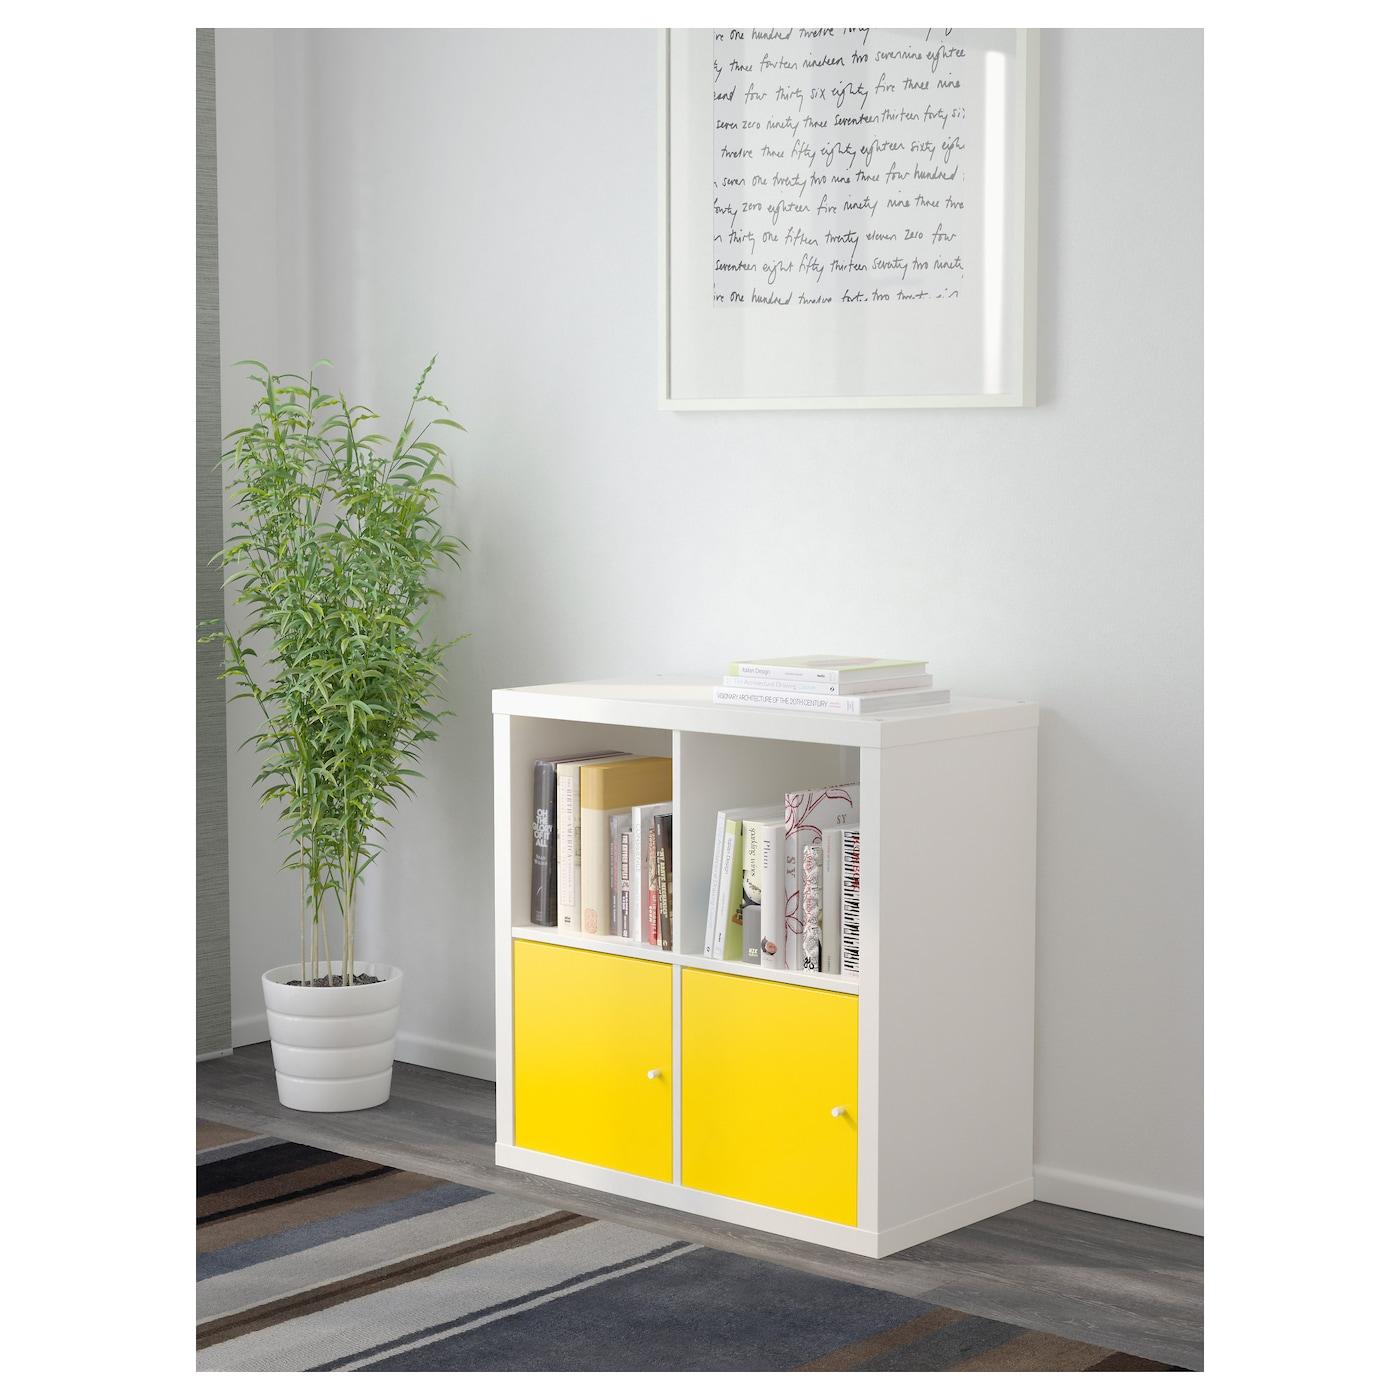 kallax tag re avec portes blanc jaune 77x77 cm ikea. Black Bedroom Furniture Sets. Home Design Ideas